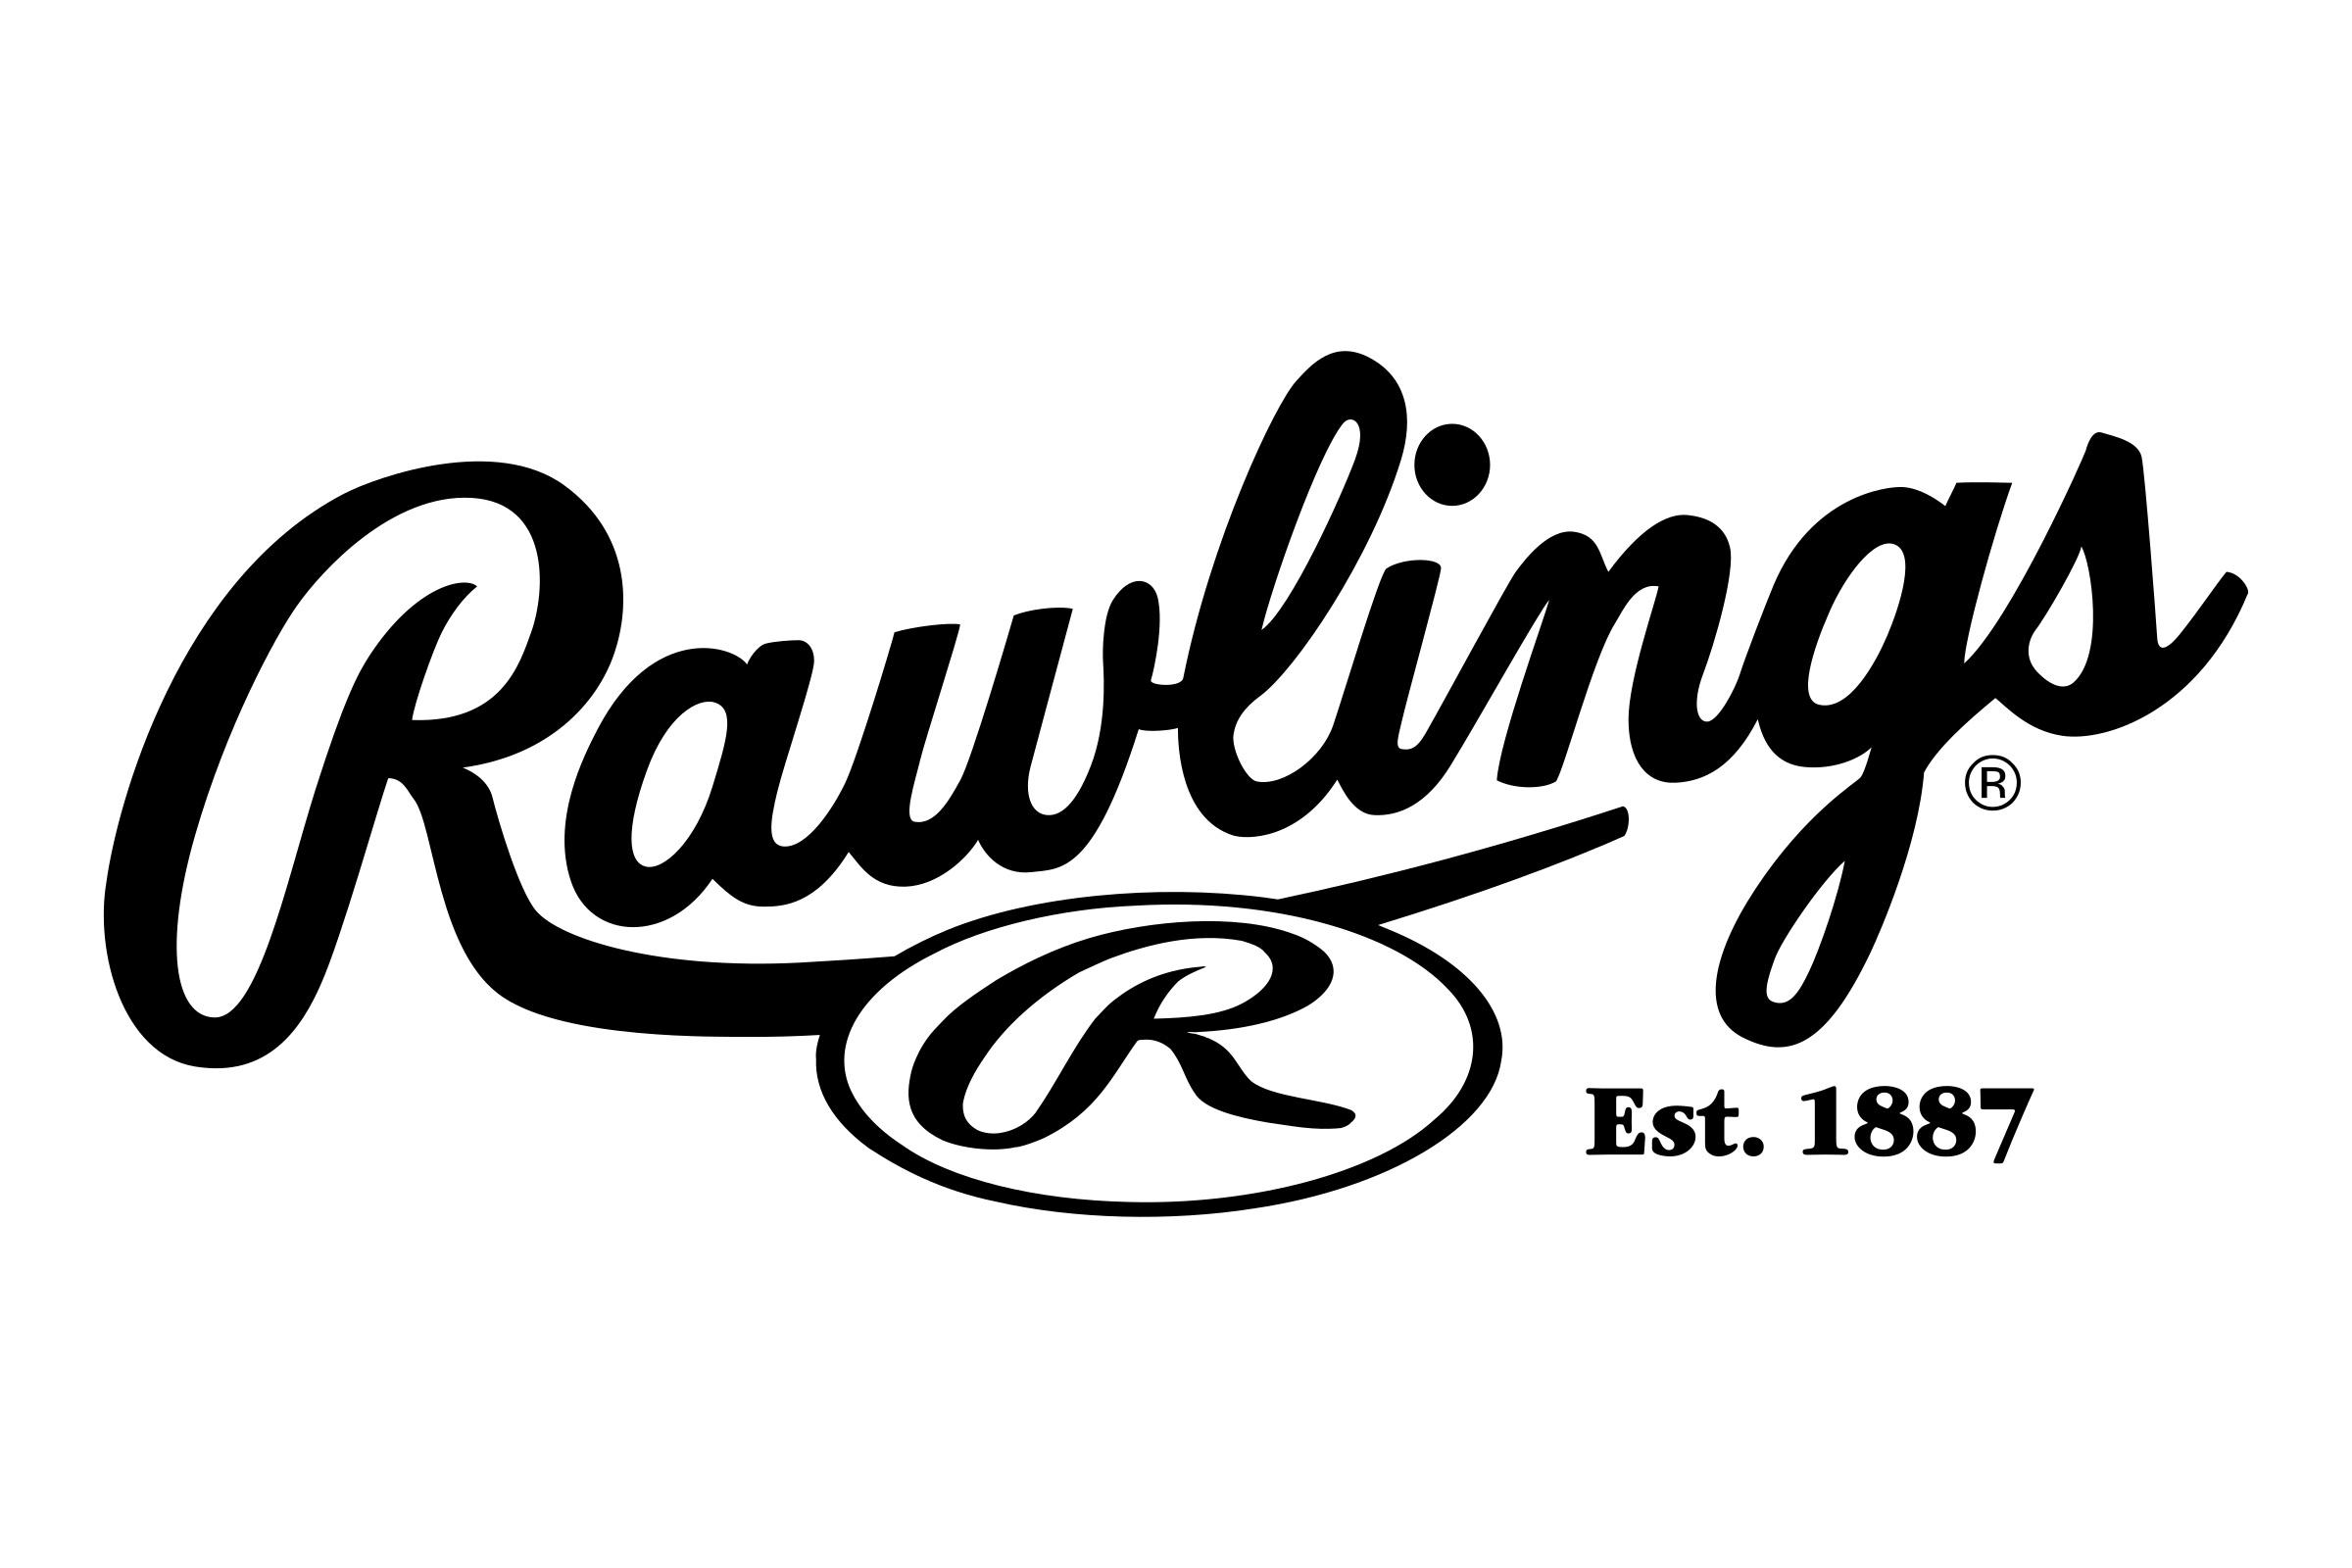 rawlings-3-logo-png-transparent.jpg